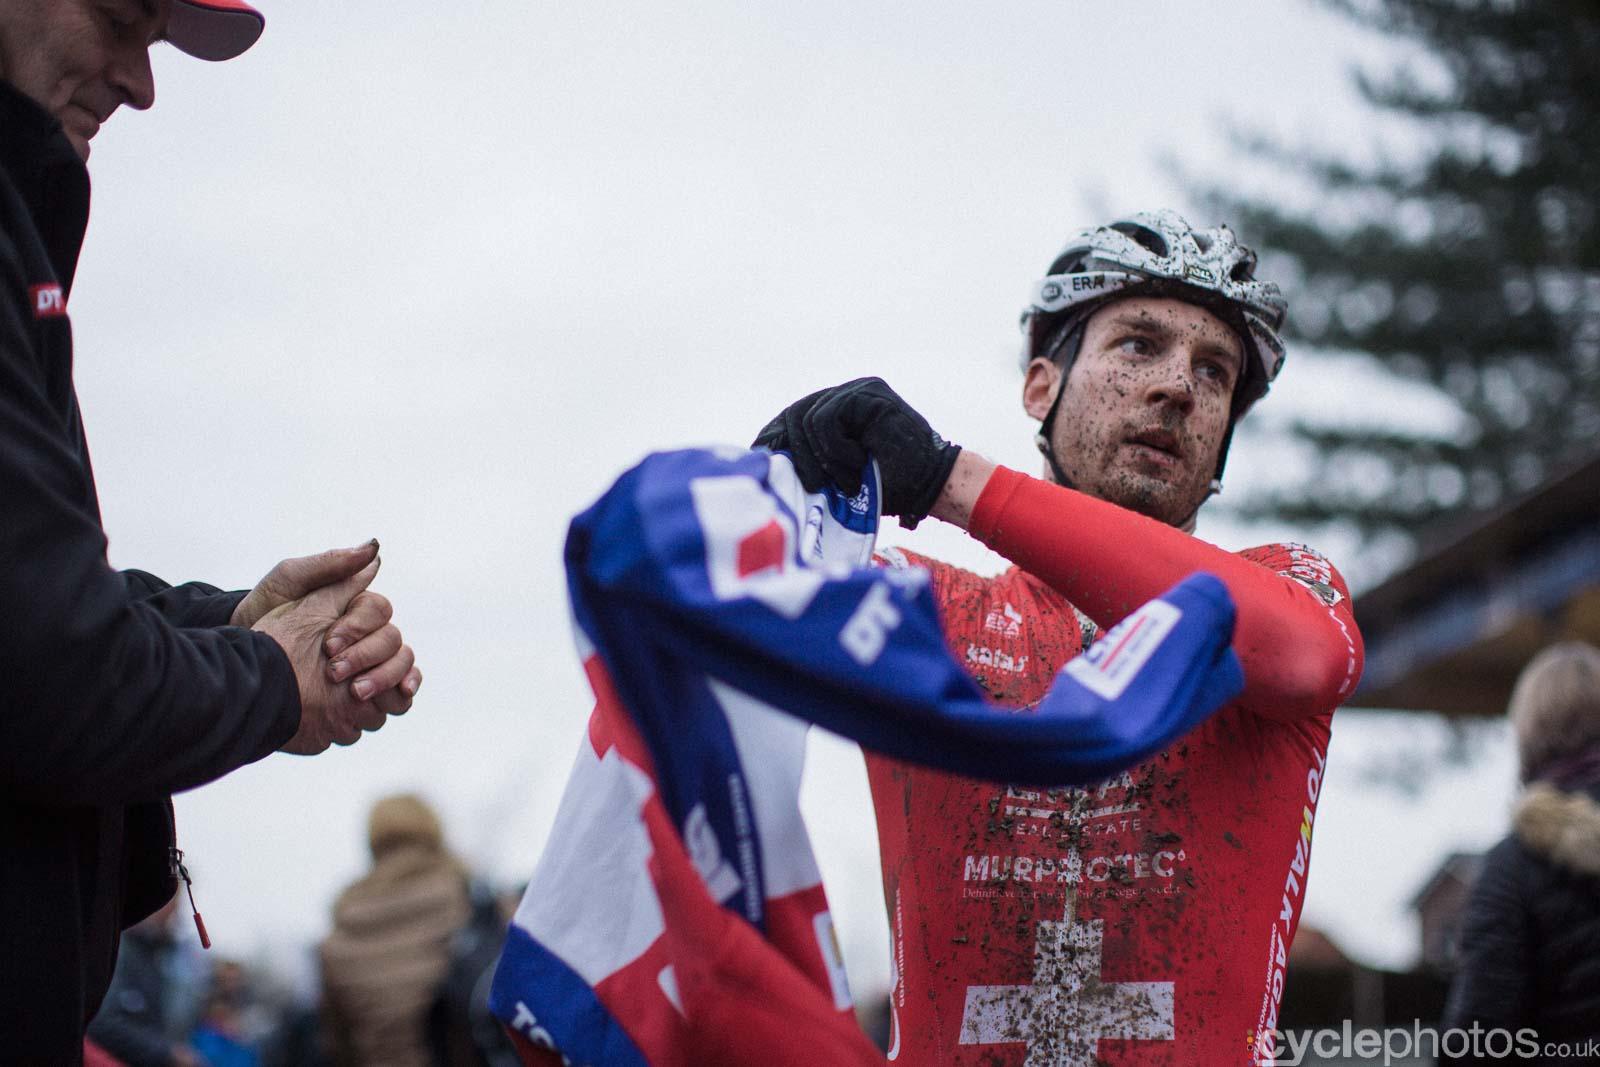 2016-cyclephotos-cyclocross-gpsvennys-160417-julien-taramarcaz